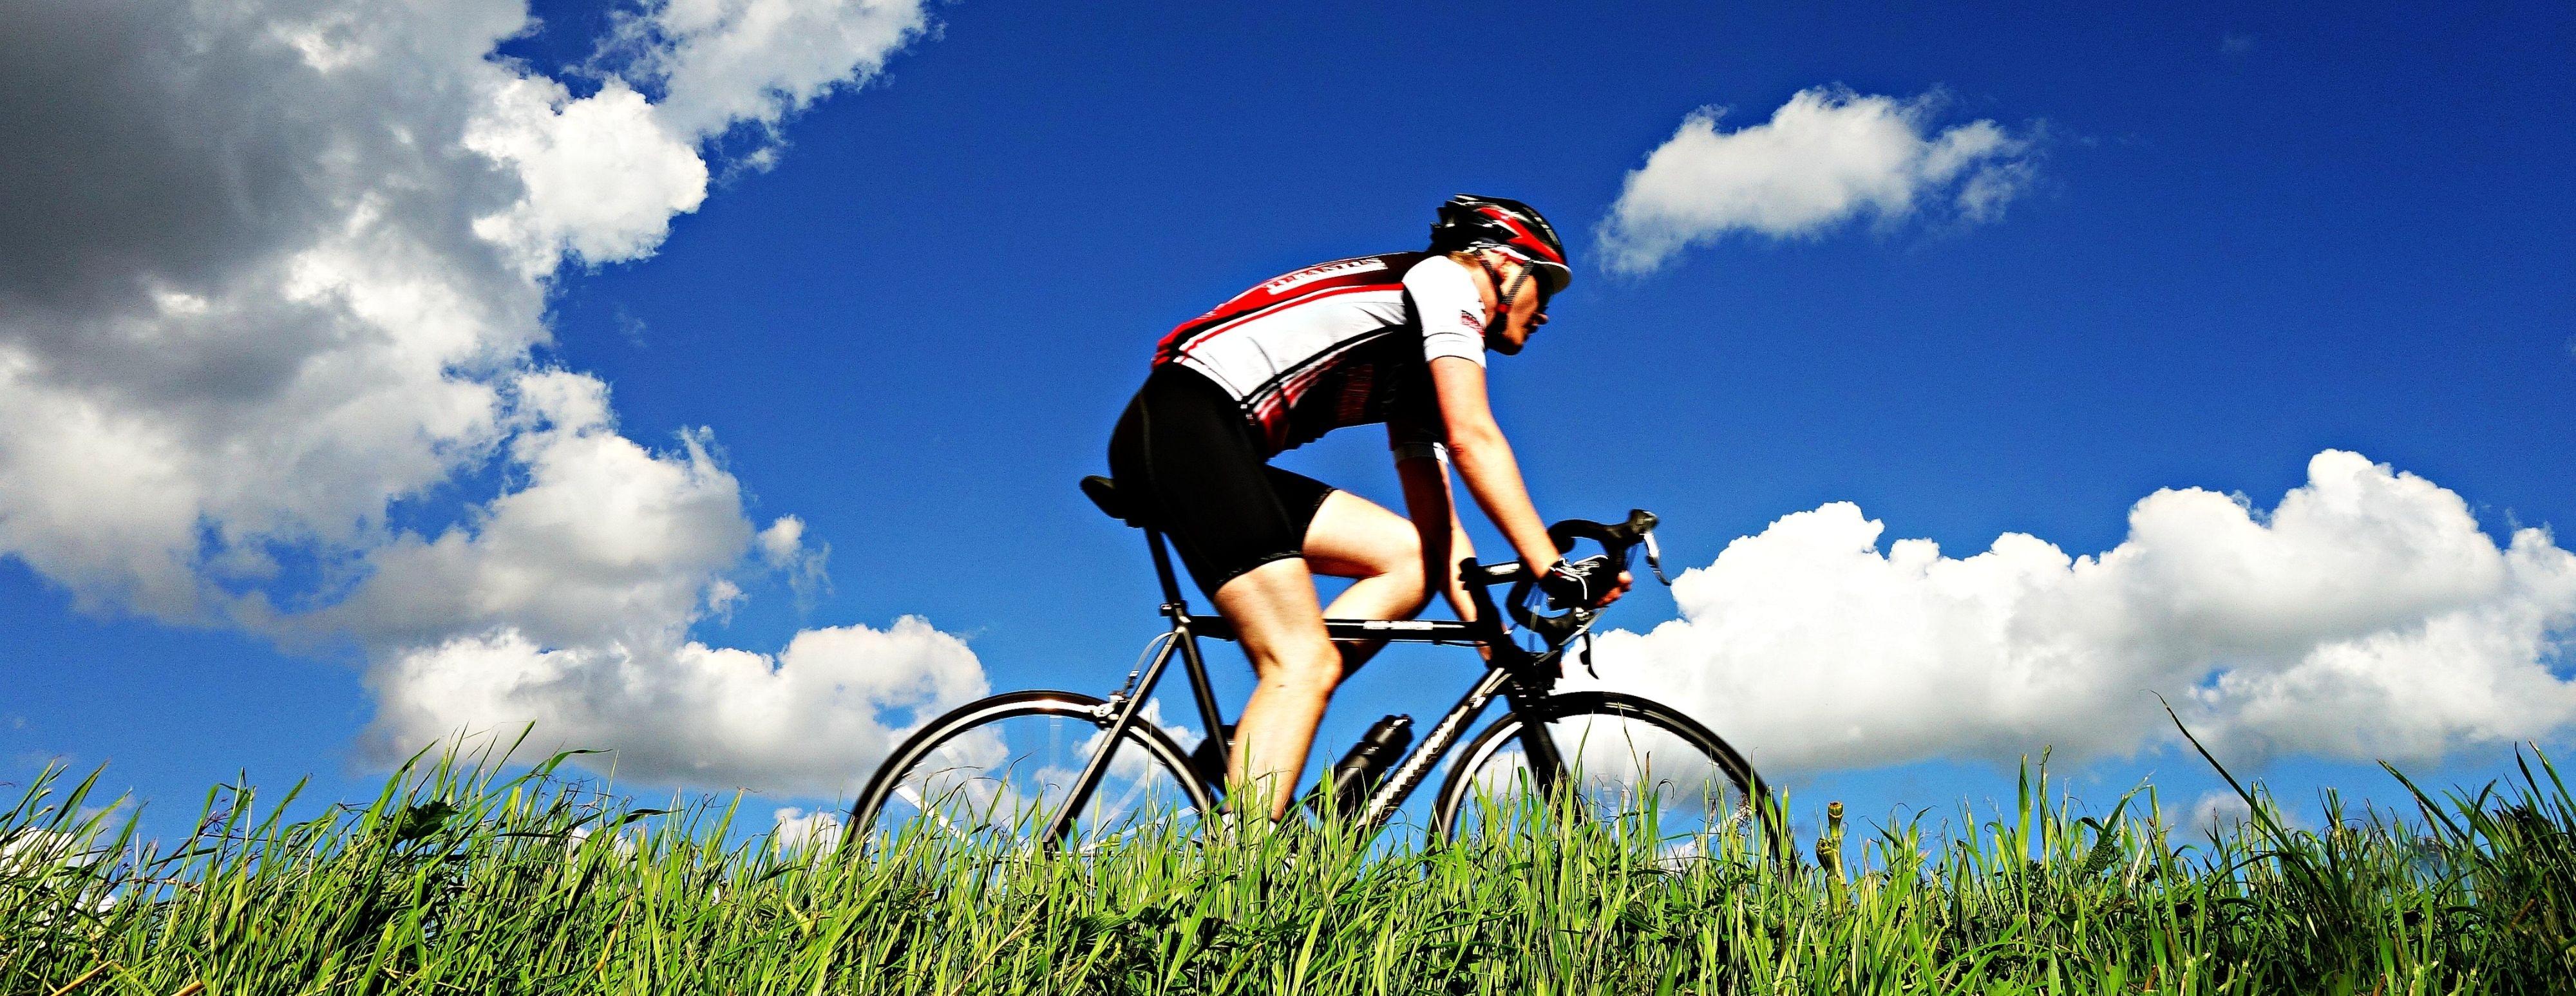 rutas en bici en españa